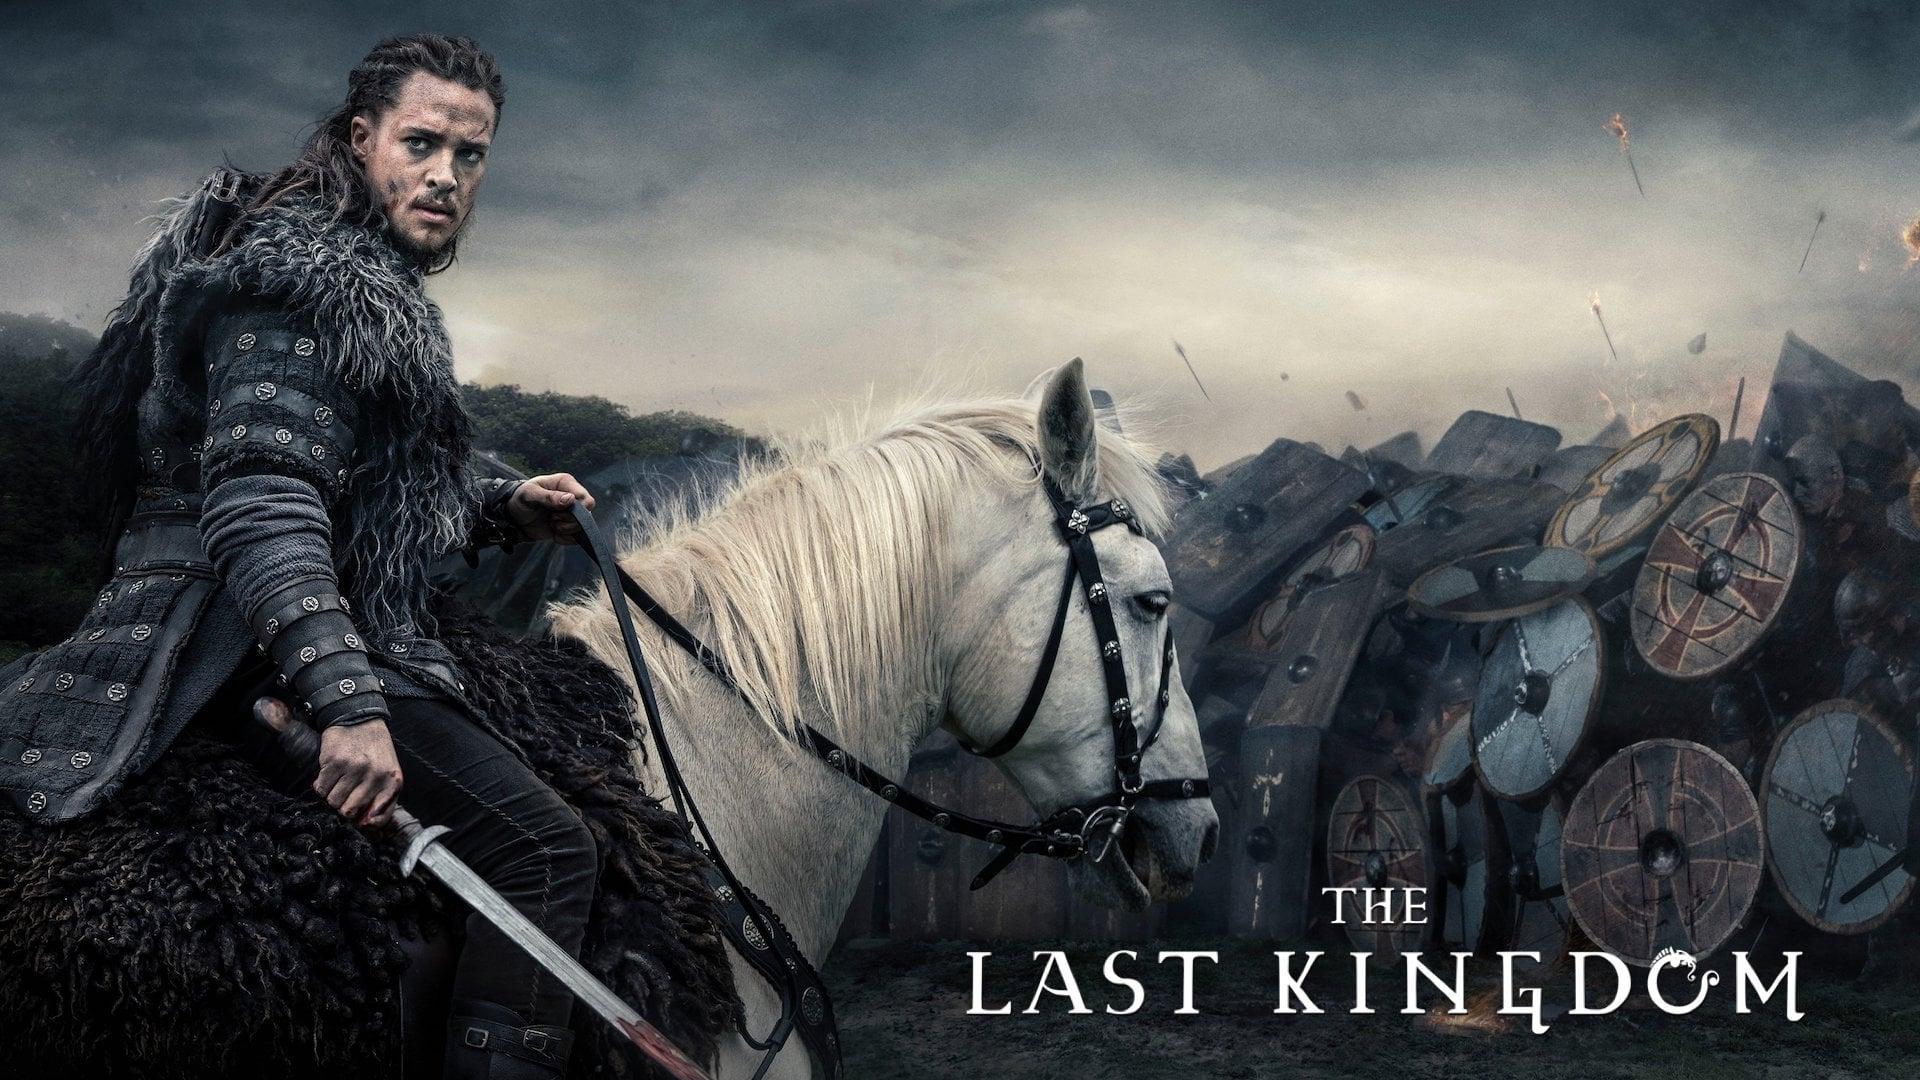 Maak kans op het vierde seizoen van The Last Kingdom